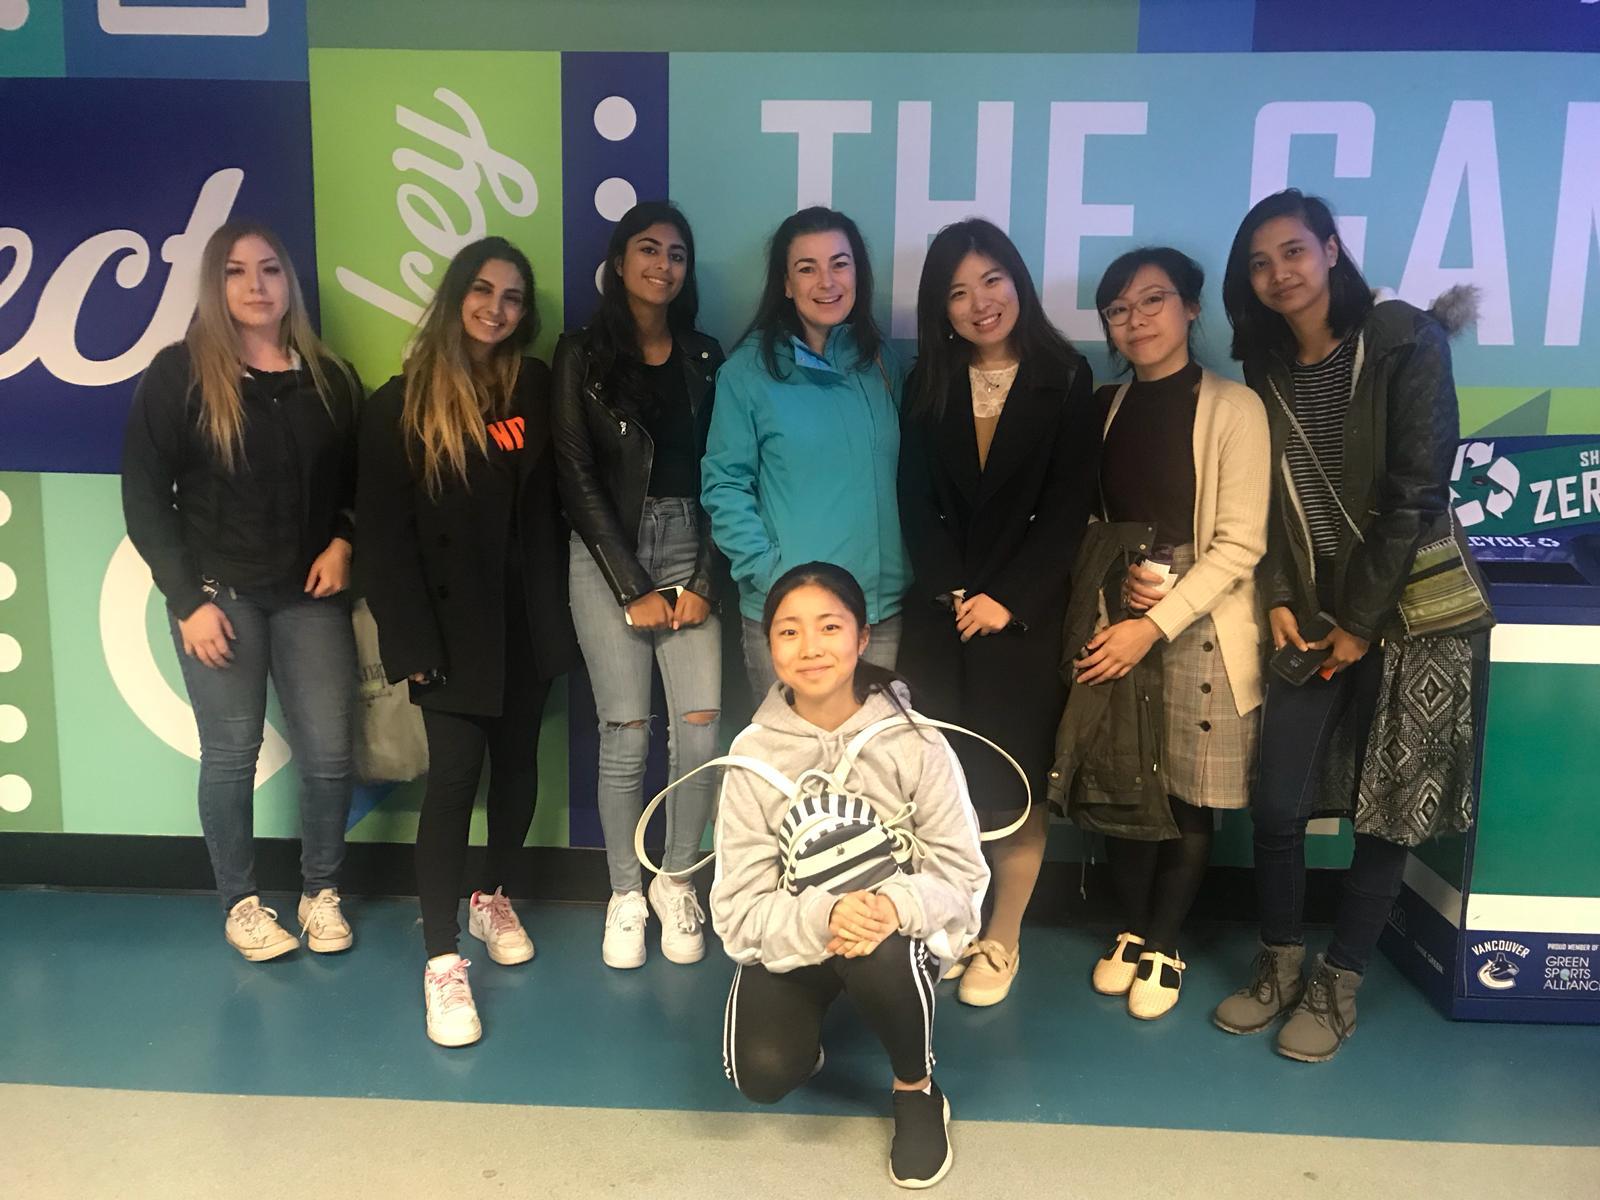 YELL Students Attending 'A Conversation with Ellen Degeneres'.